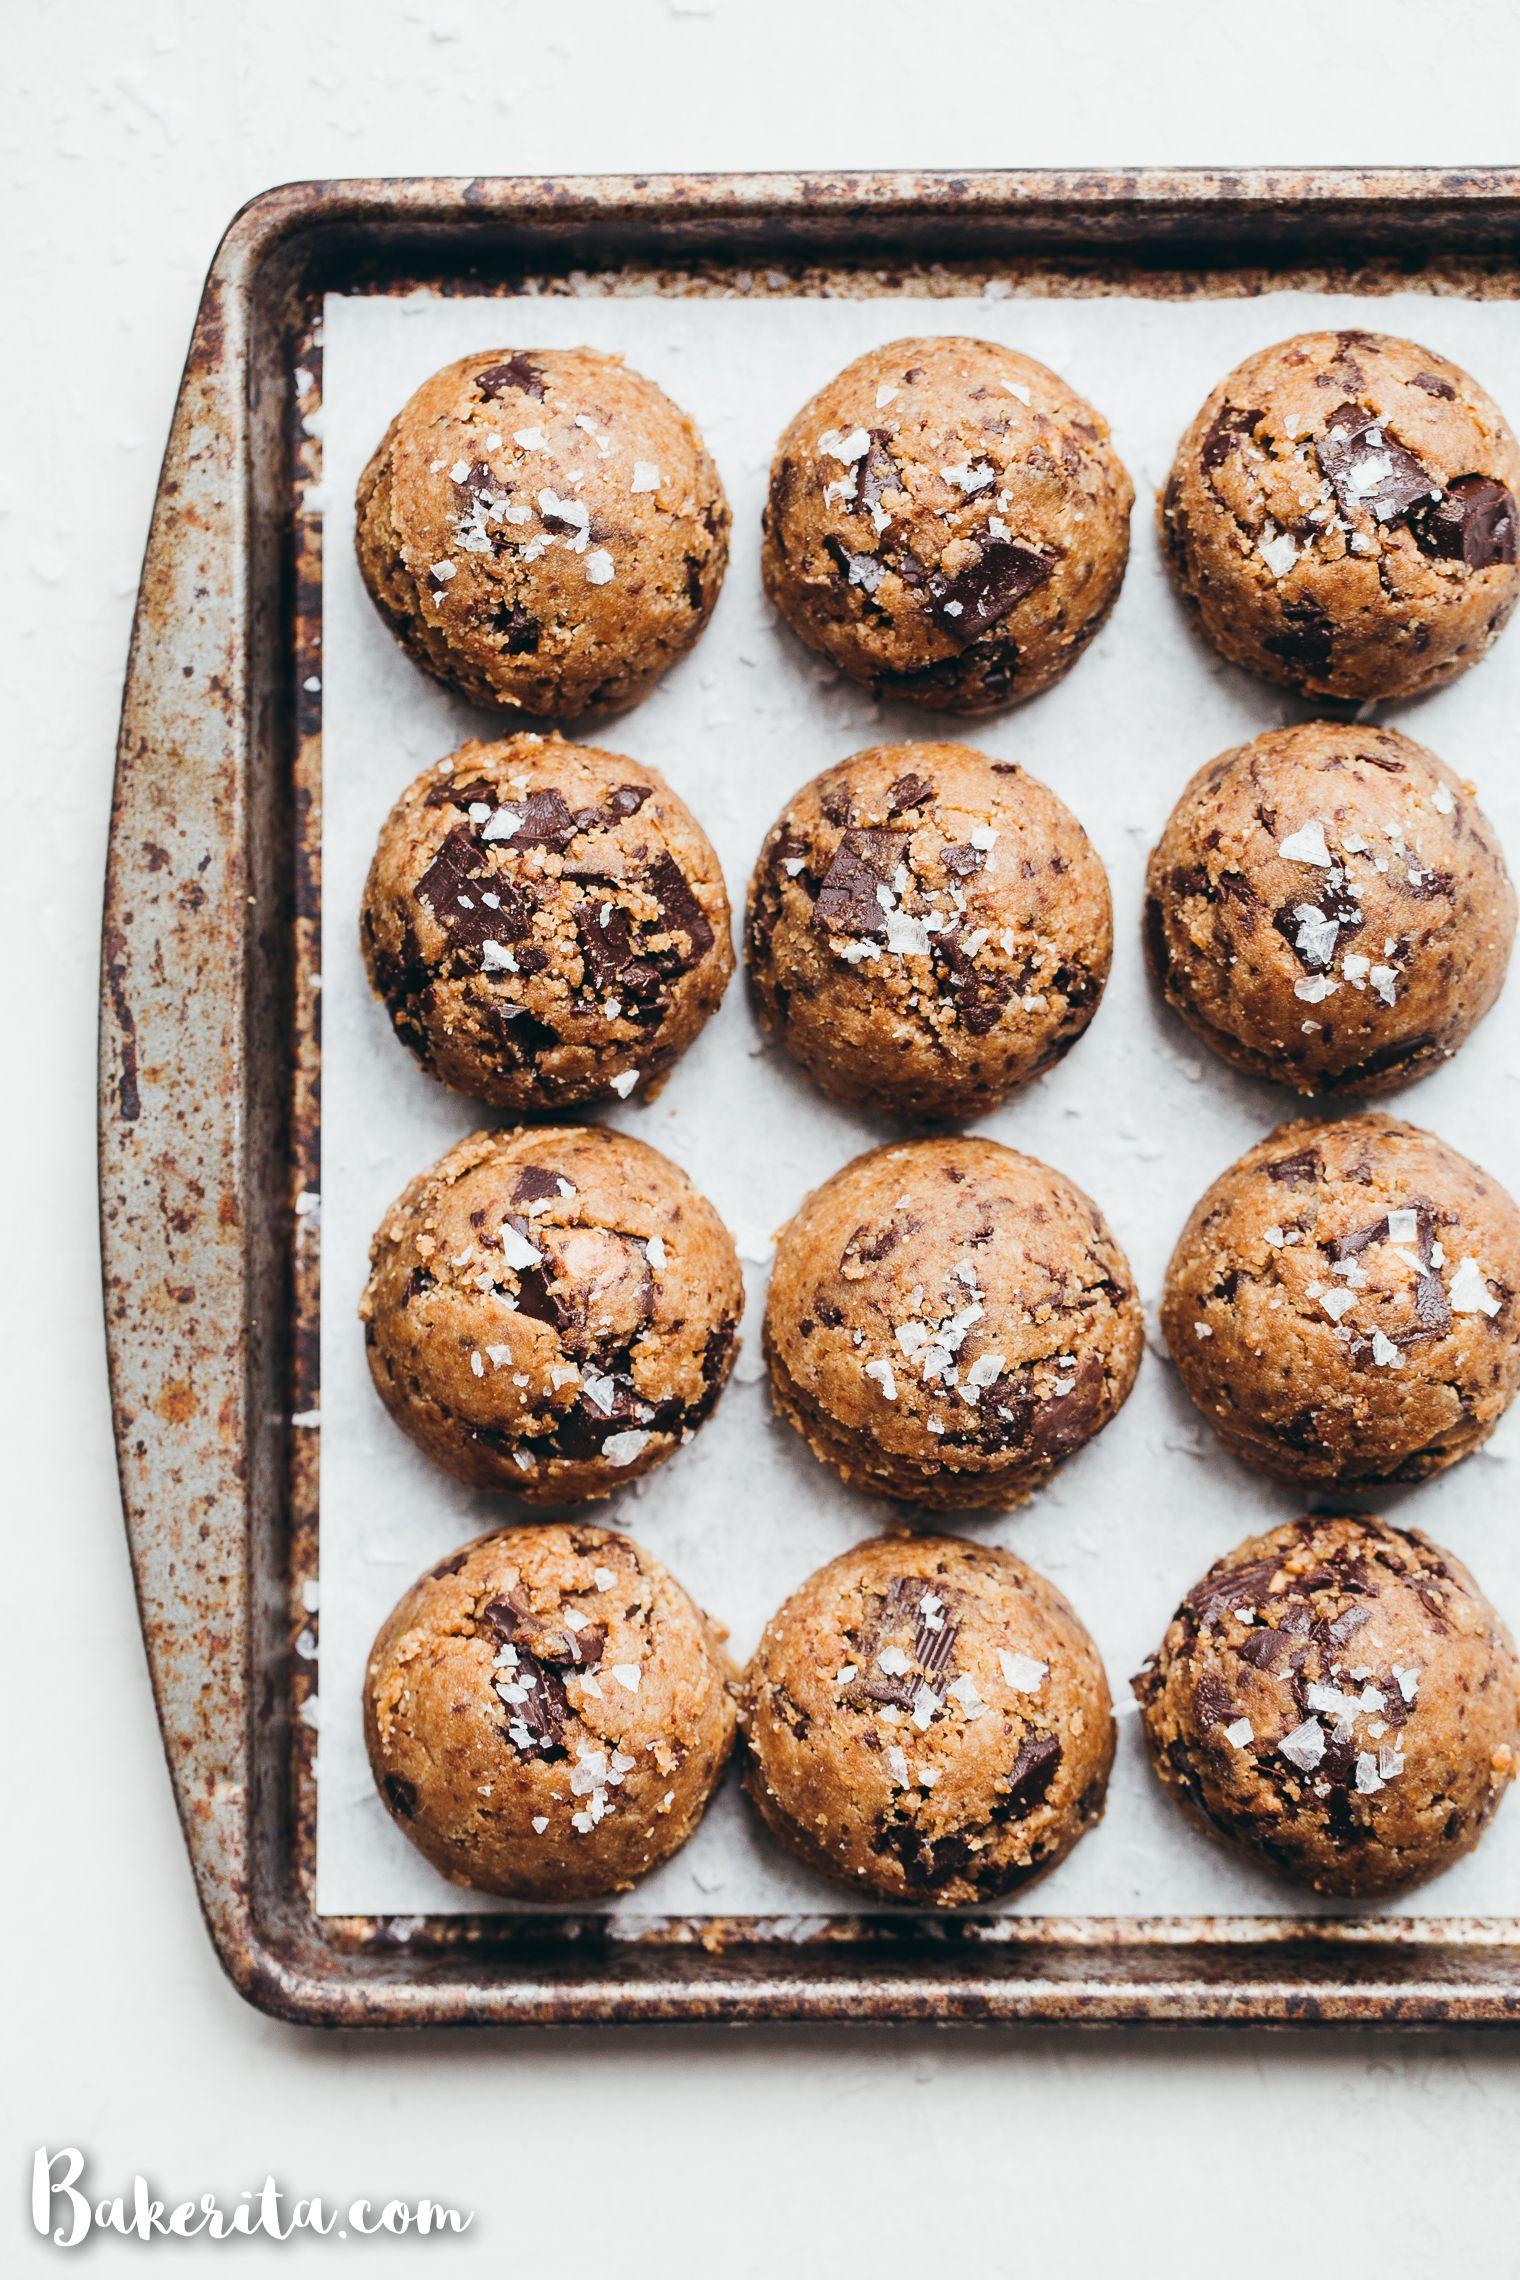 Peanut Butter Chocolate Chip Cookies (Gluten Free & Vegan) • Bakerita